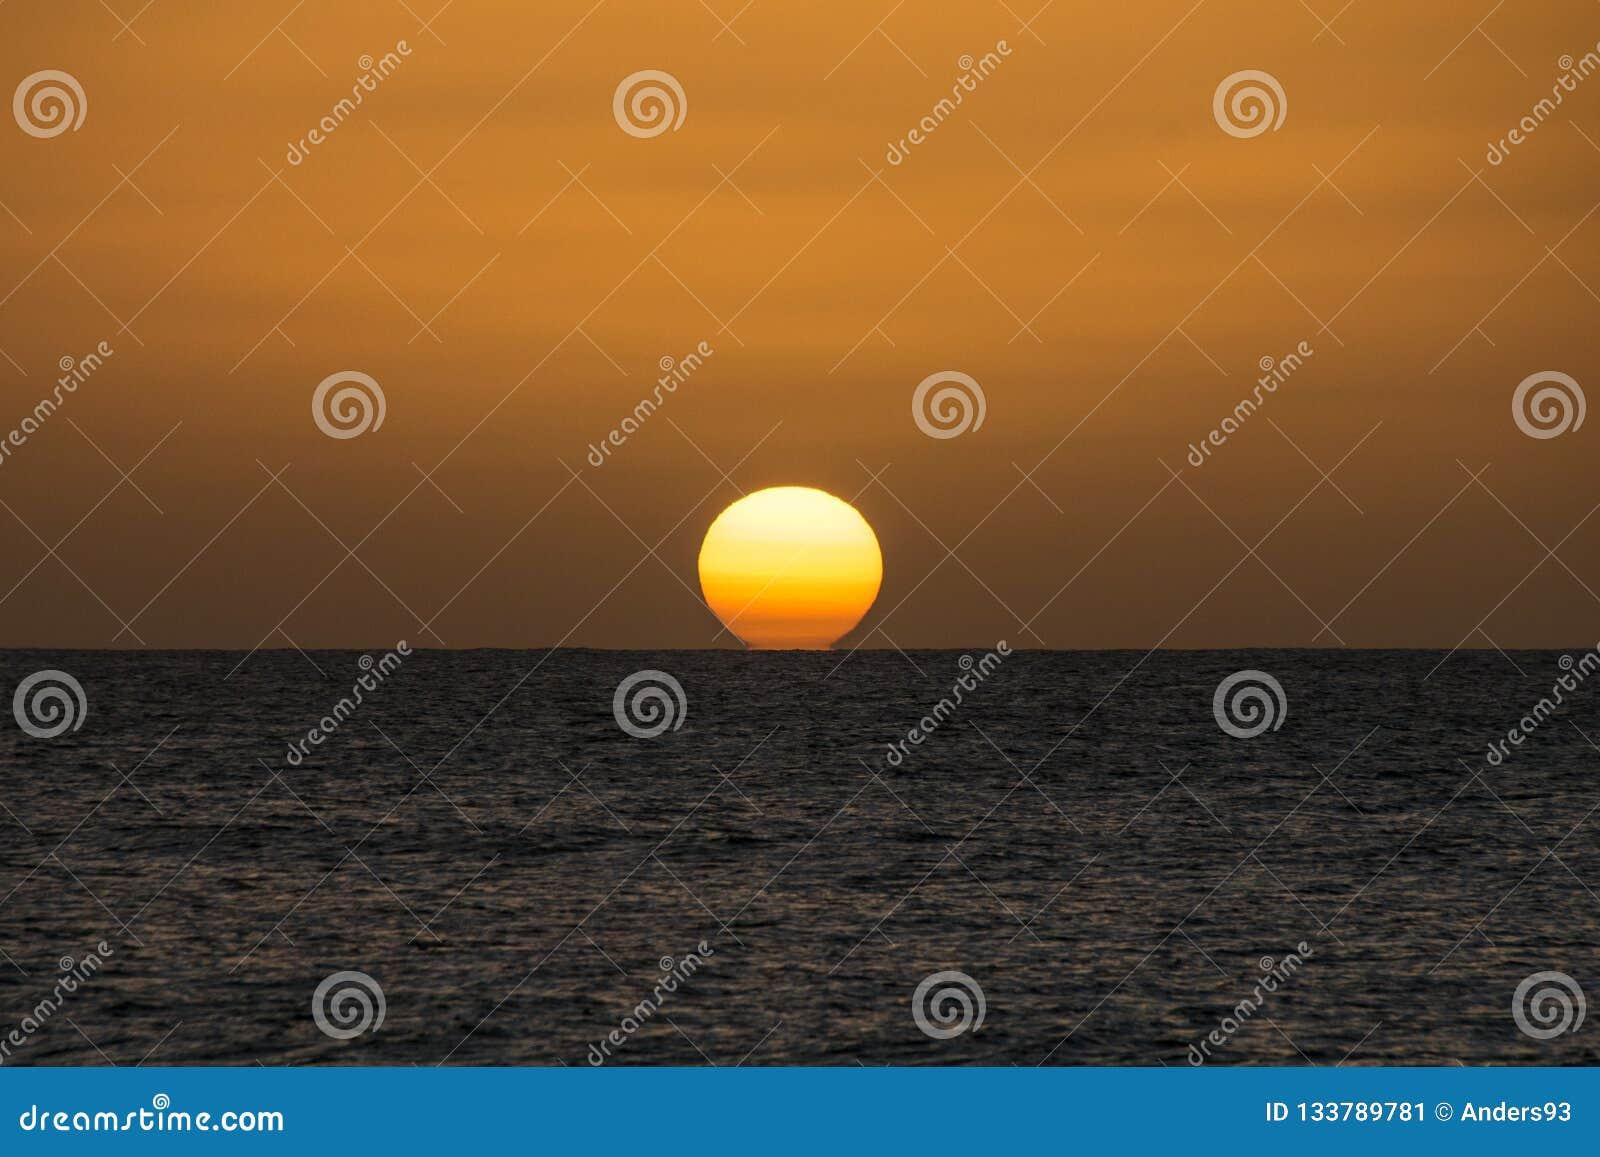 Zmierzch nad Atlantyckim oceanem od boa vista, przylądek Verde, Afryka